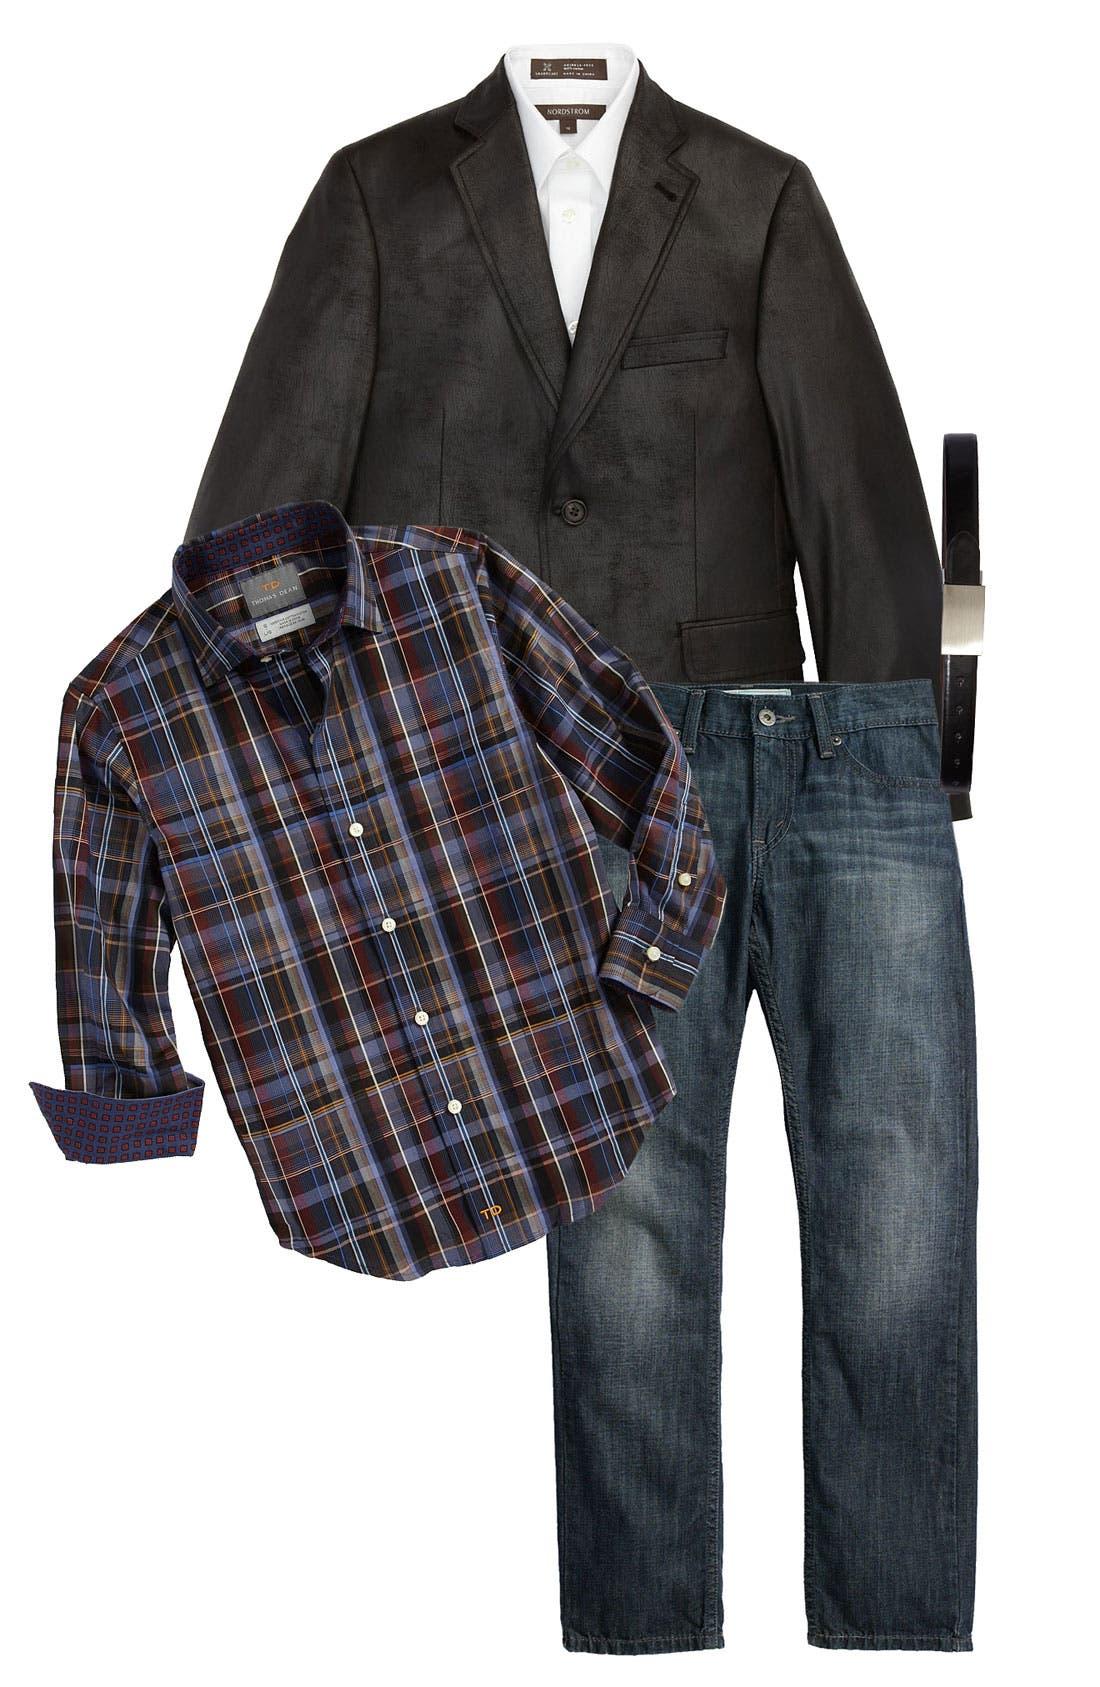 Alternate Image 1 Selected - Joseph Abboud Blazer, Thomas Dean Dress Shirt & Levi's® Jeans (Big Boys)